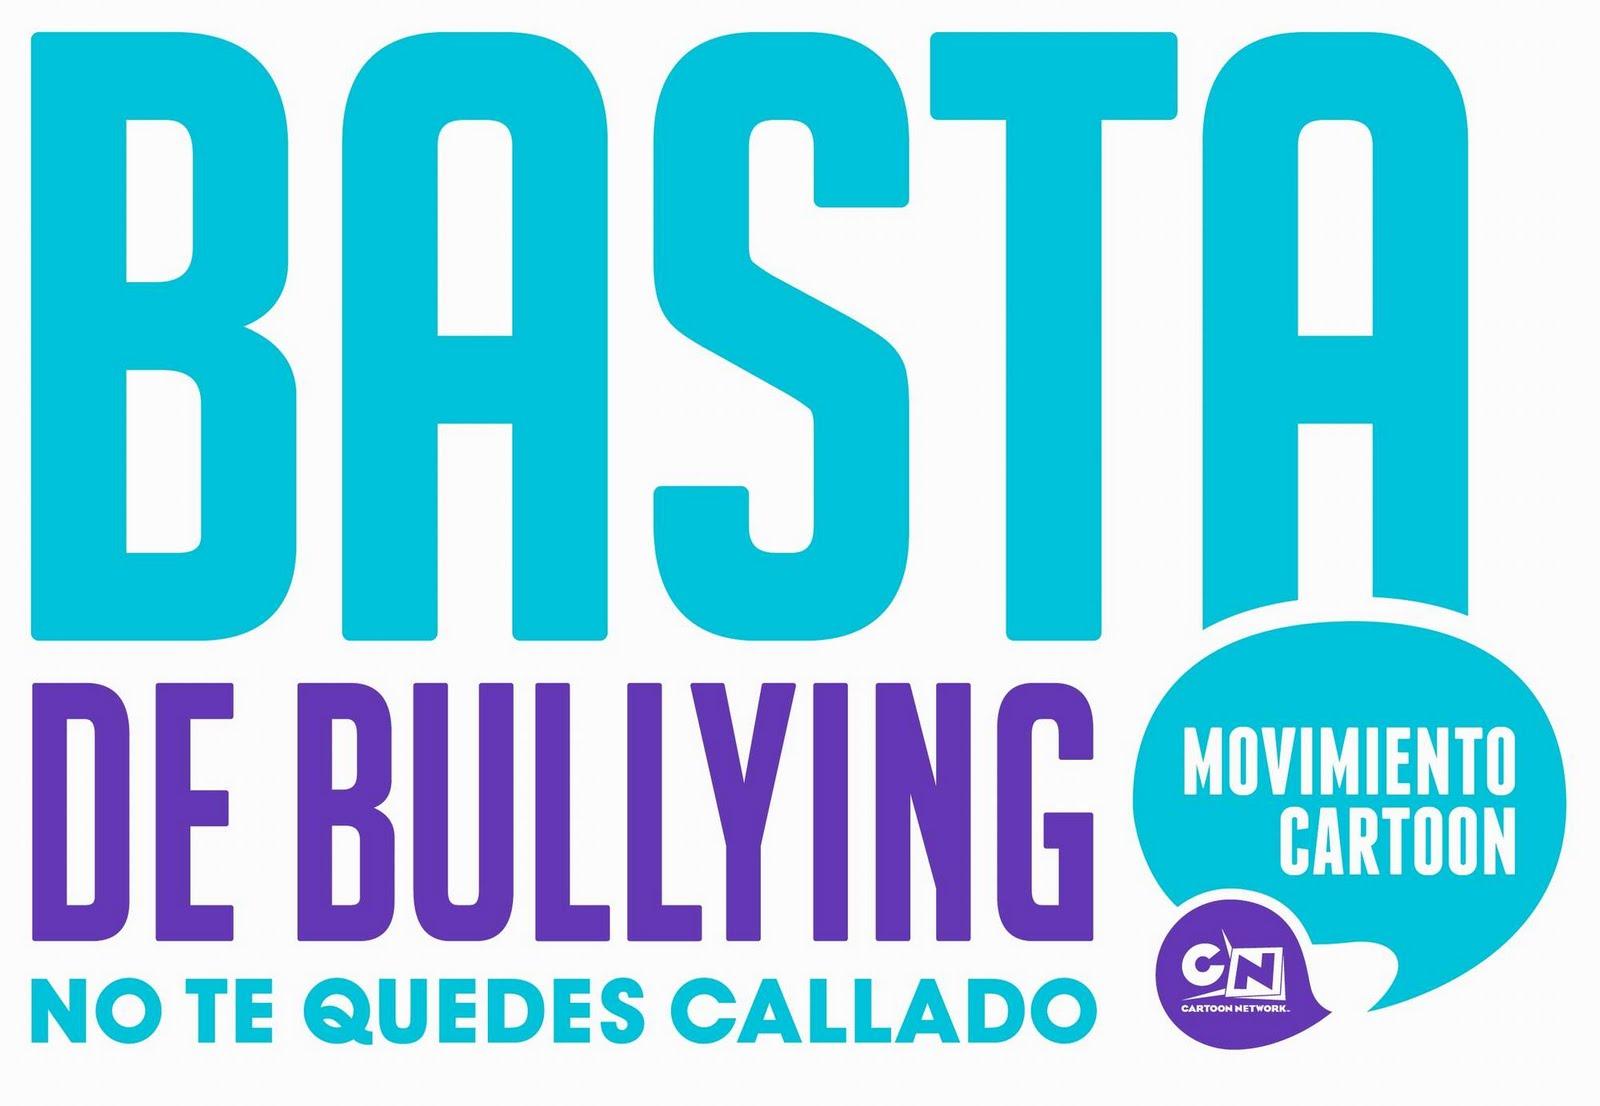 No bullying logo stop bullying